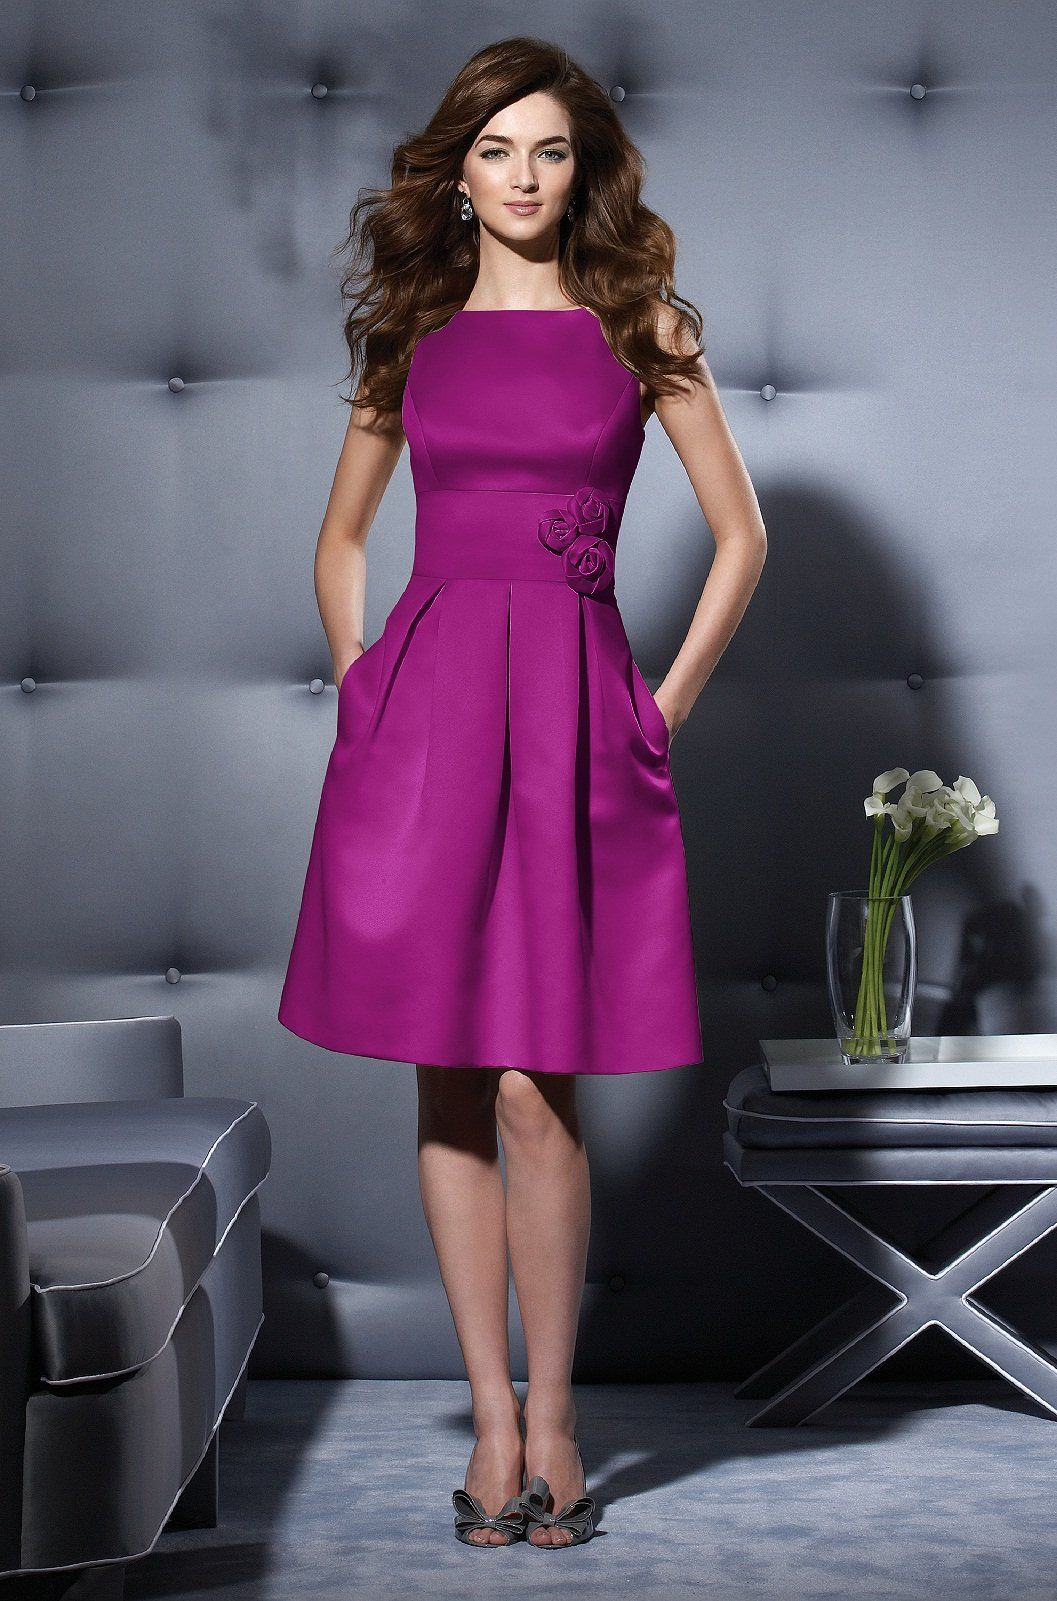 satin cocktail dress in Persian plum | Aguilera | Pinterest ...